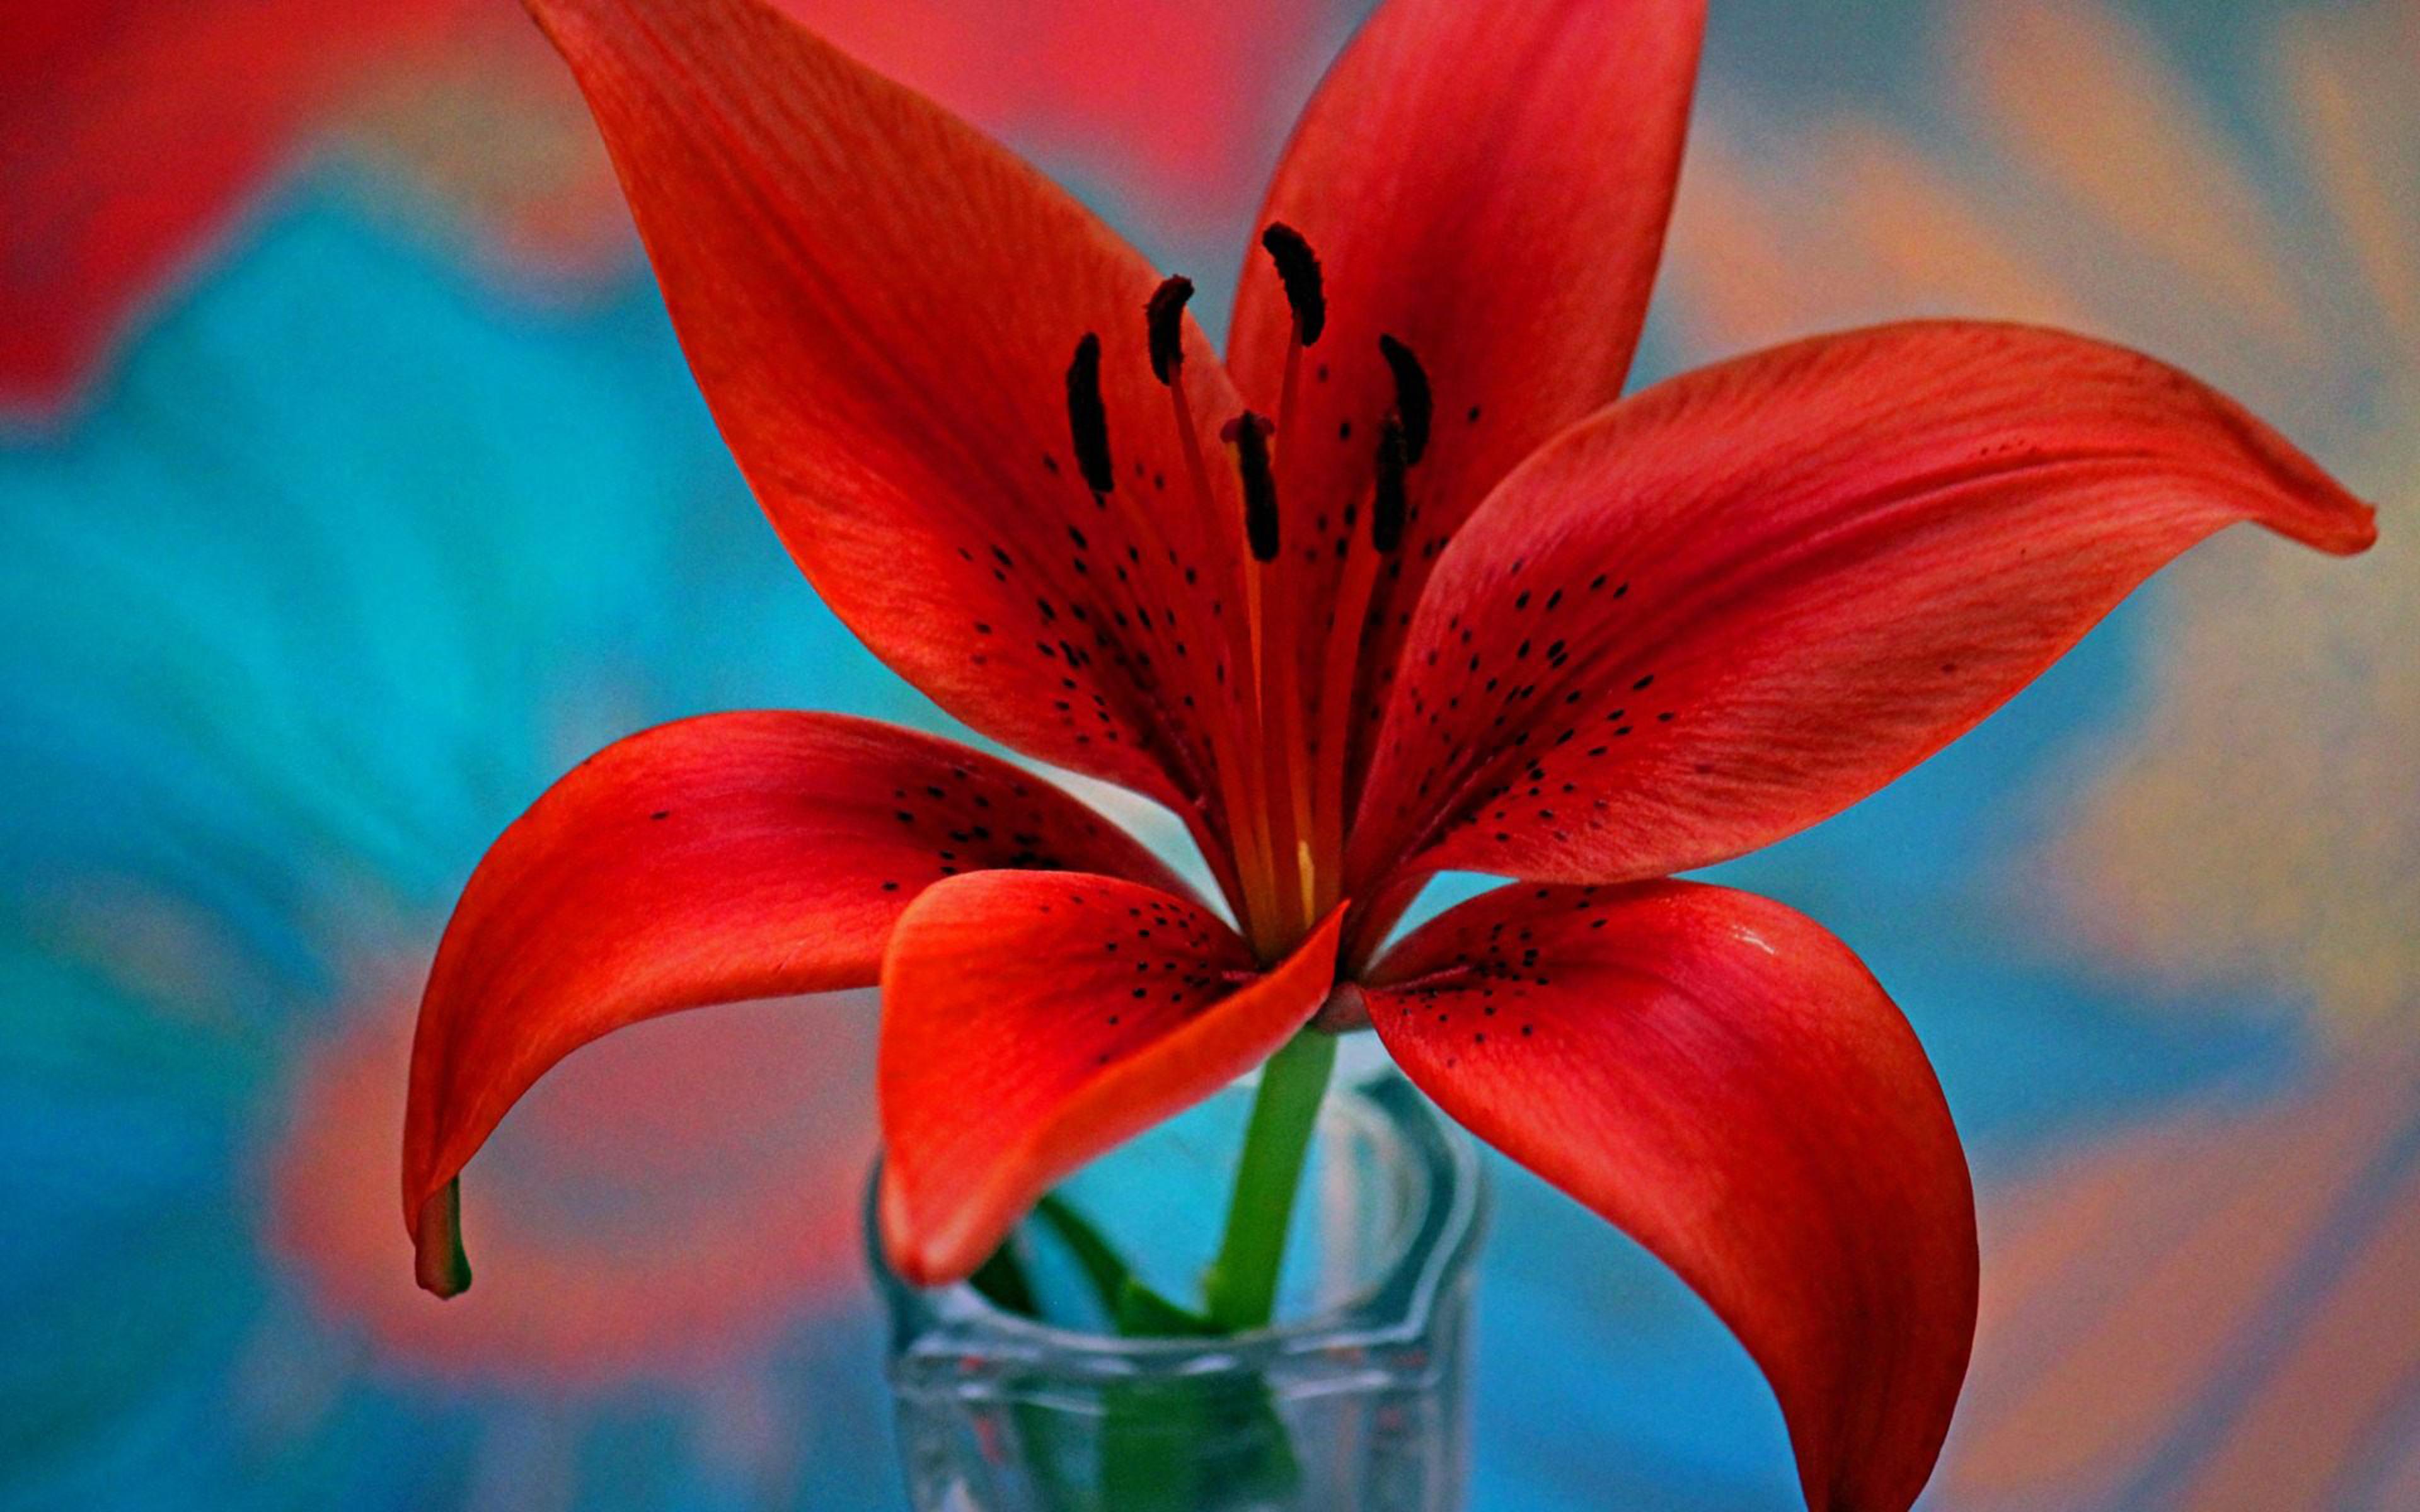 Dinosaur Wallpaper Cute Red Lily Flower Wallpaper For Desktop Hd 3840x2400